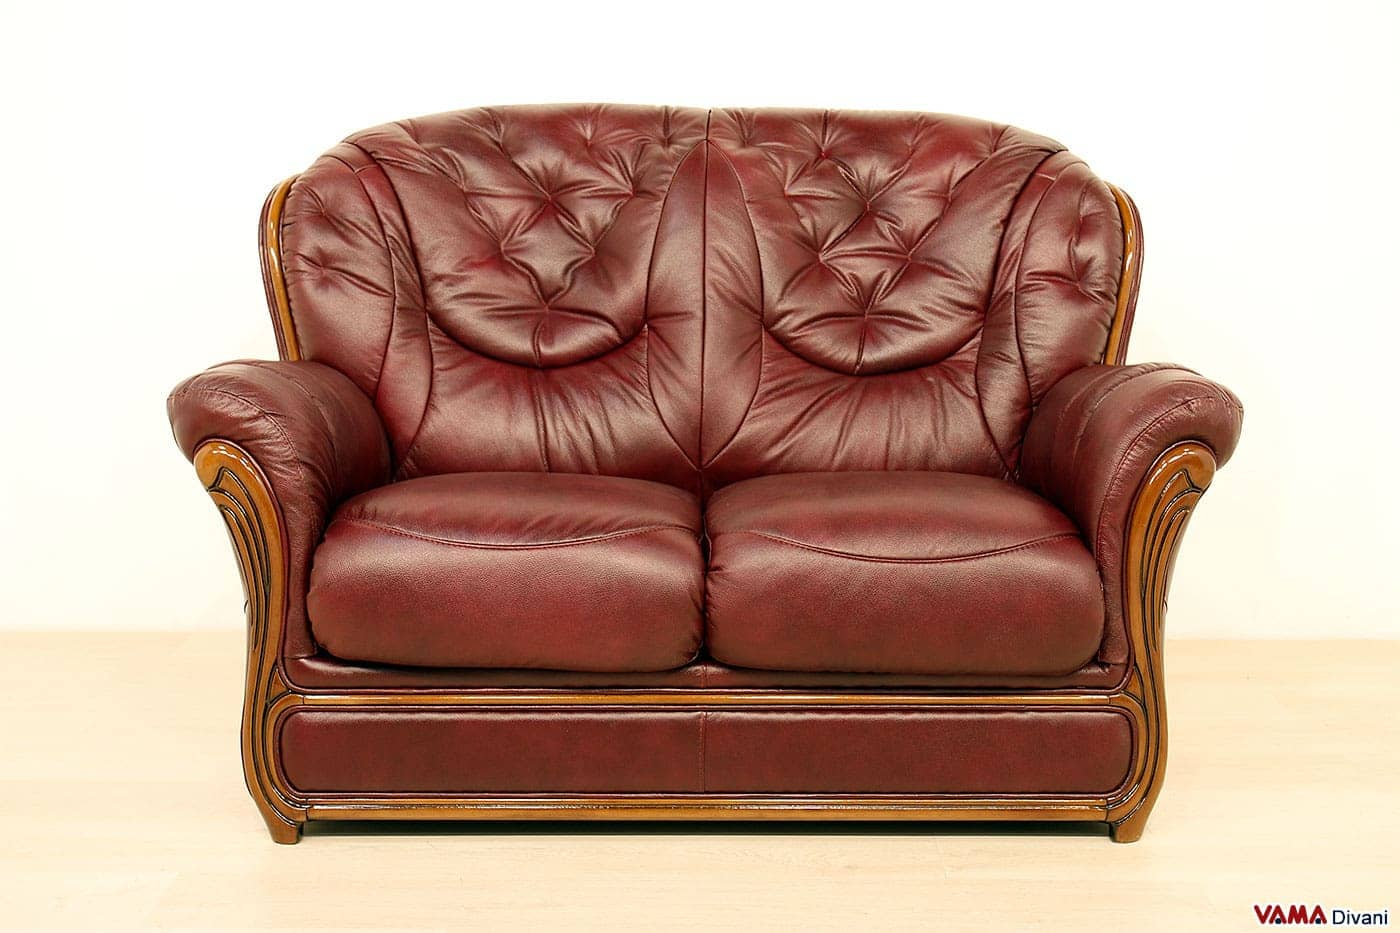 Offerta divano 2 posti vintage vama divani - Divano 2 posti dimensioni ...